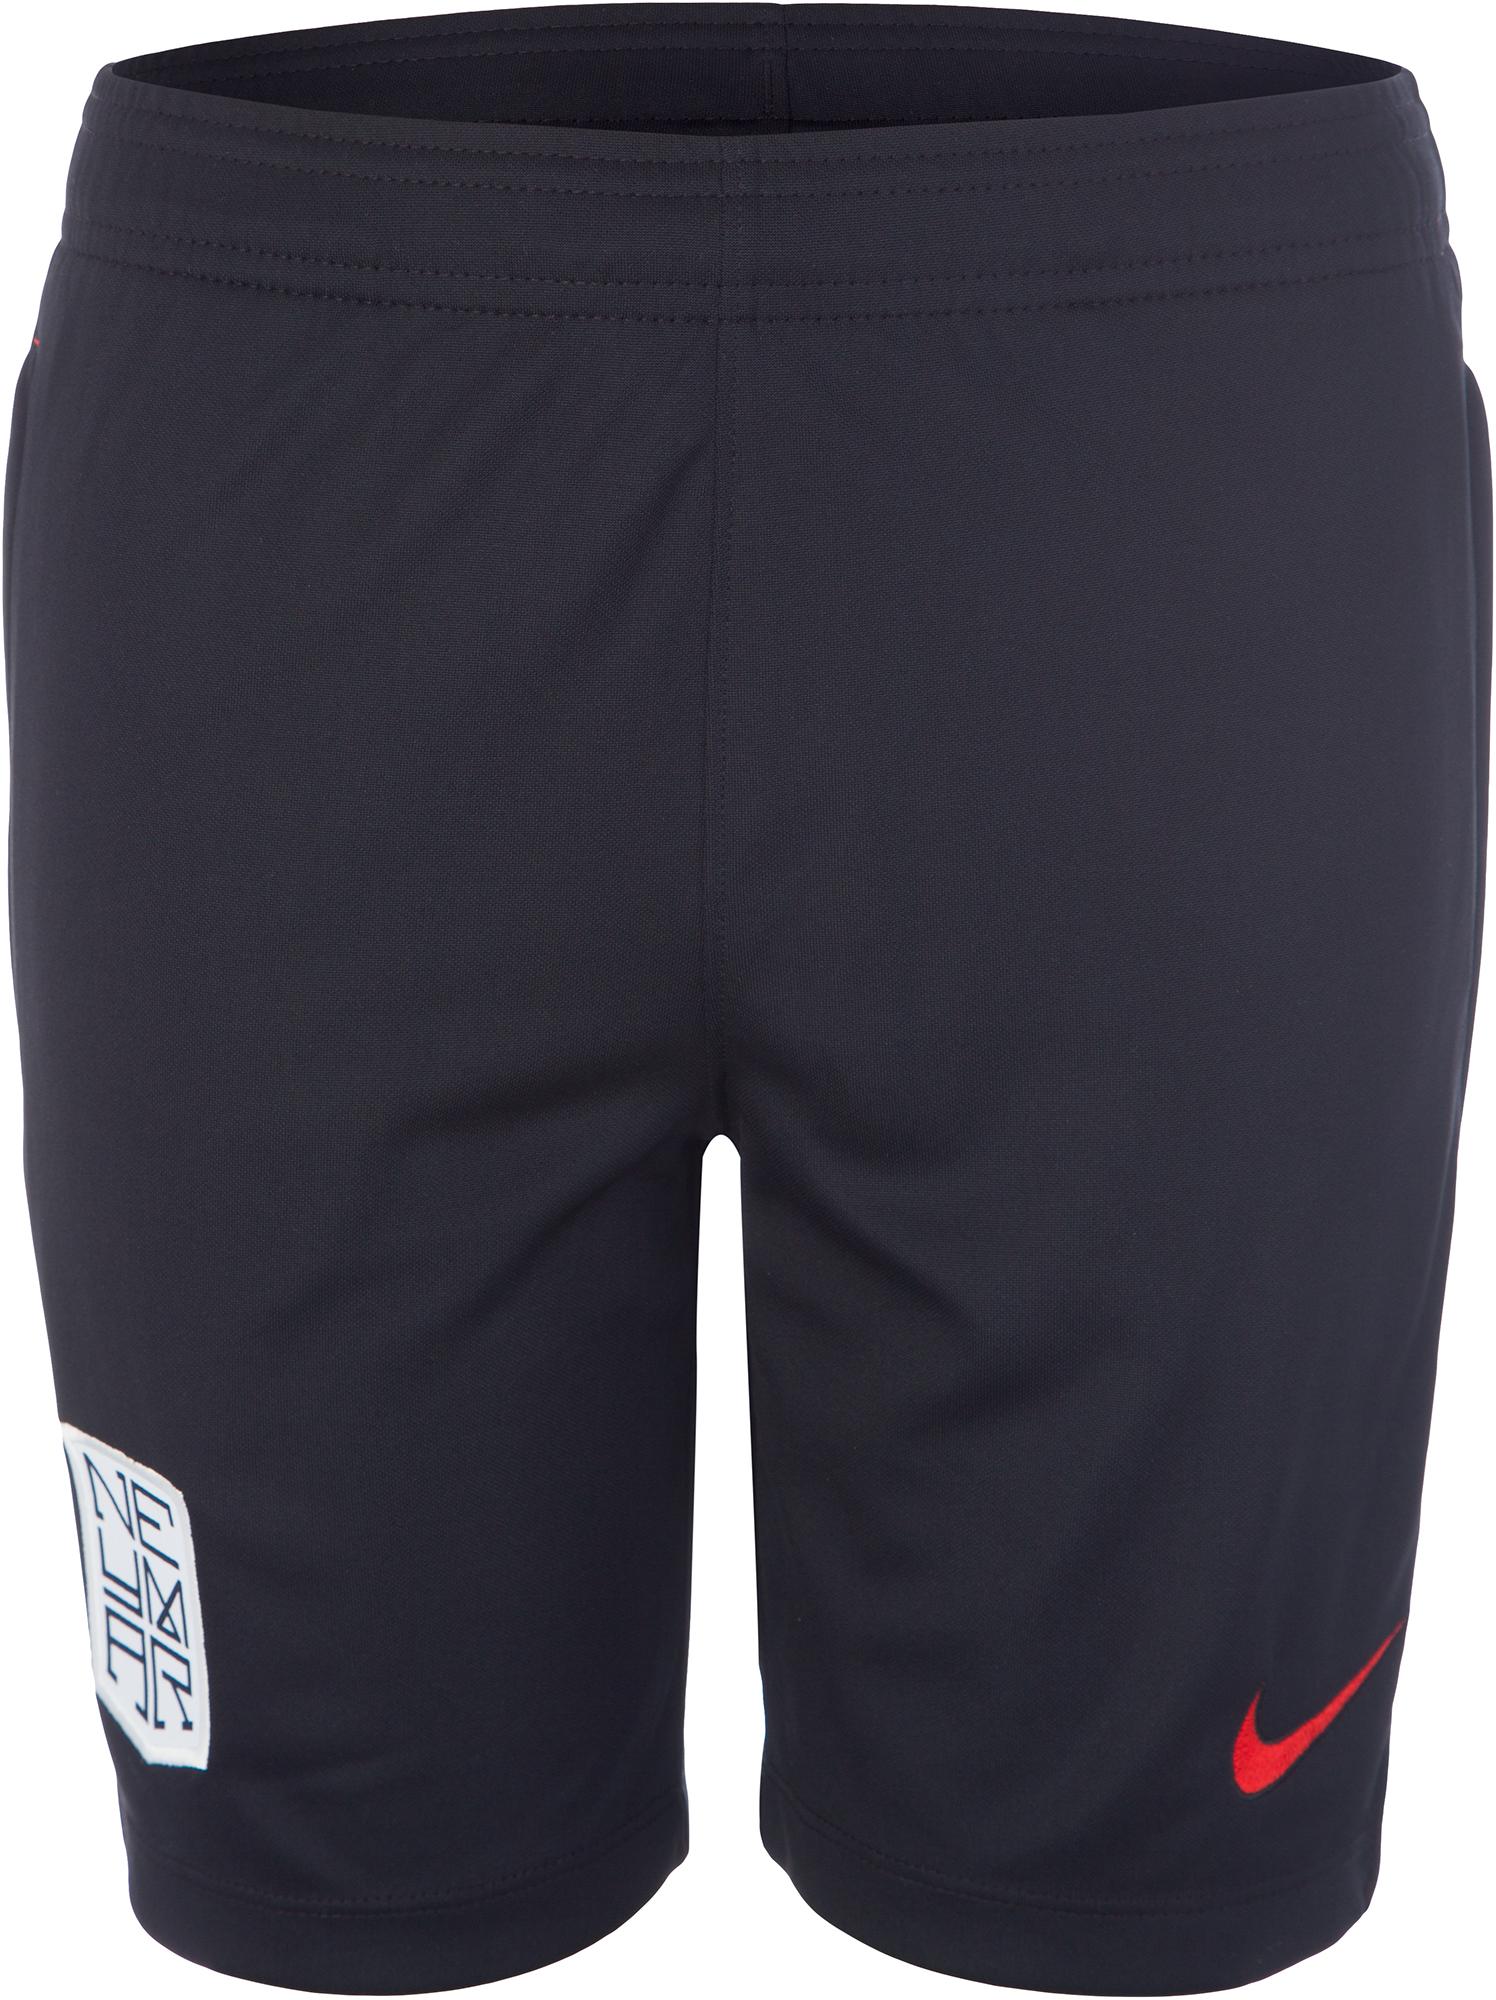 цена на Nike Шорты для мальчиков Nike Neymar, размер 158-170